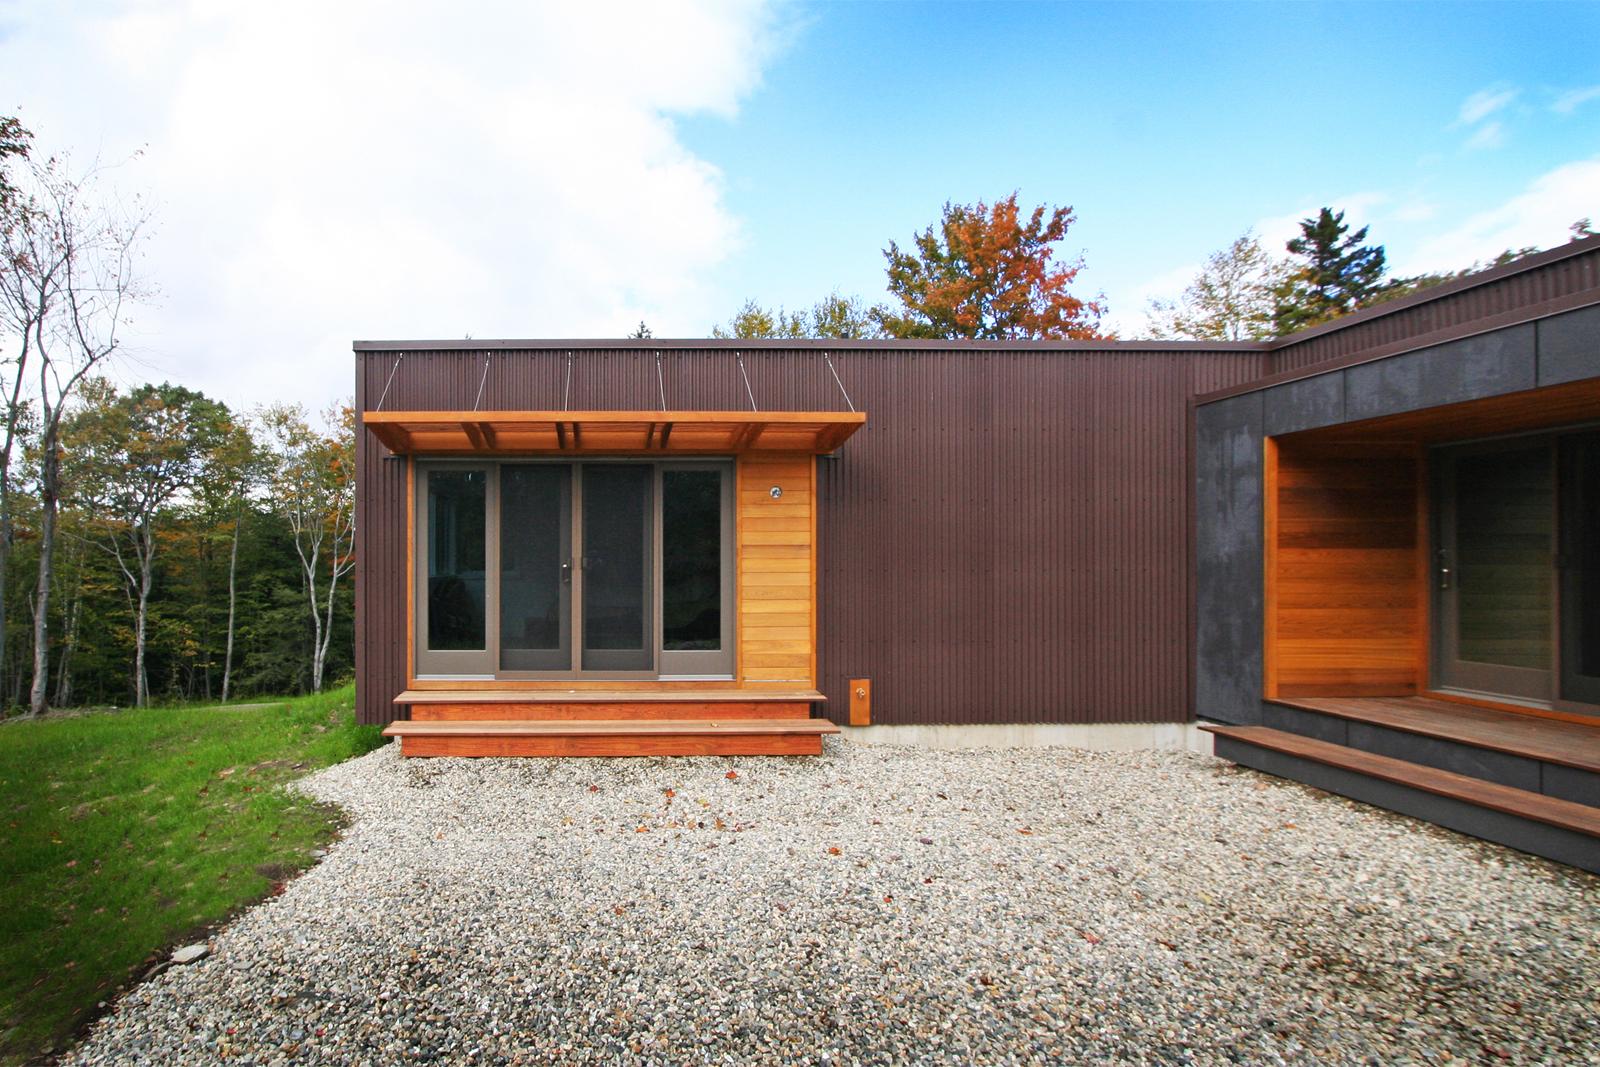 04-res4-resolution-4-architecture-modern-modular-home-prefab-house-vermont-cabin-exterior.jpg